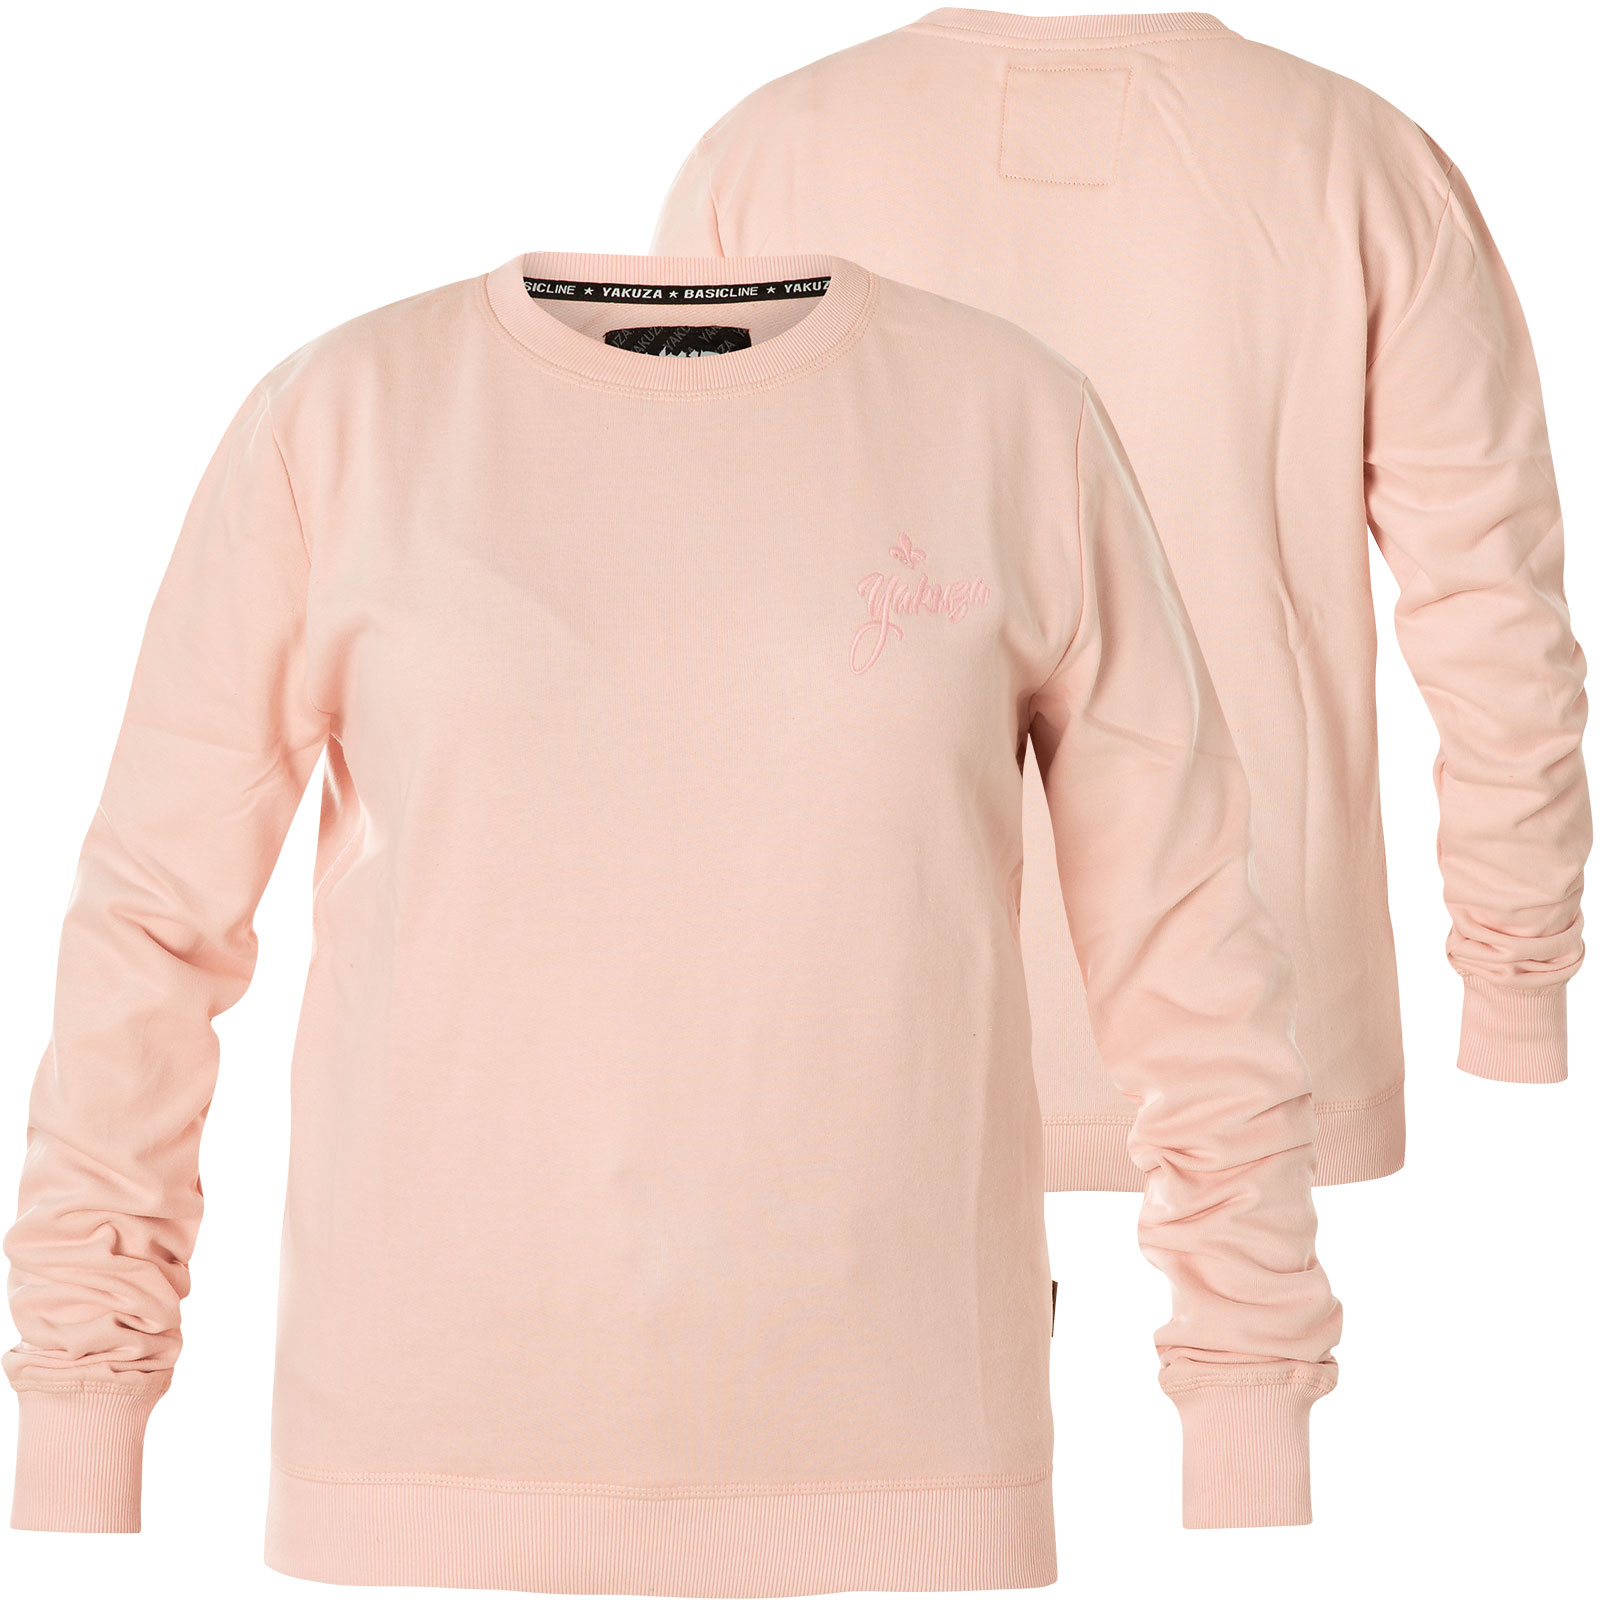 timeless design b2282 9b262 Yakuza Damen Pullover Basic Line Script Sweatshirt GPB-14140 Chrystal Pink  Rosa